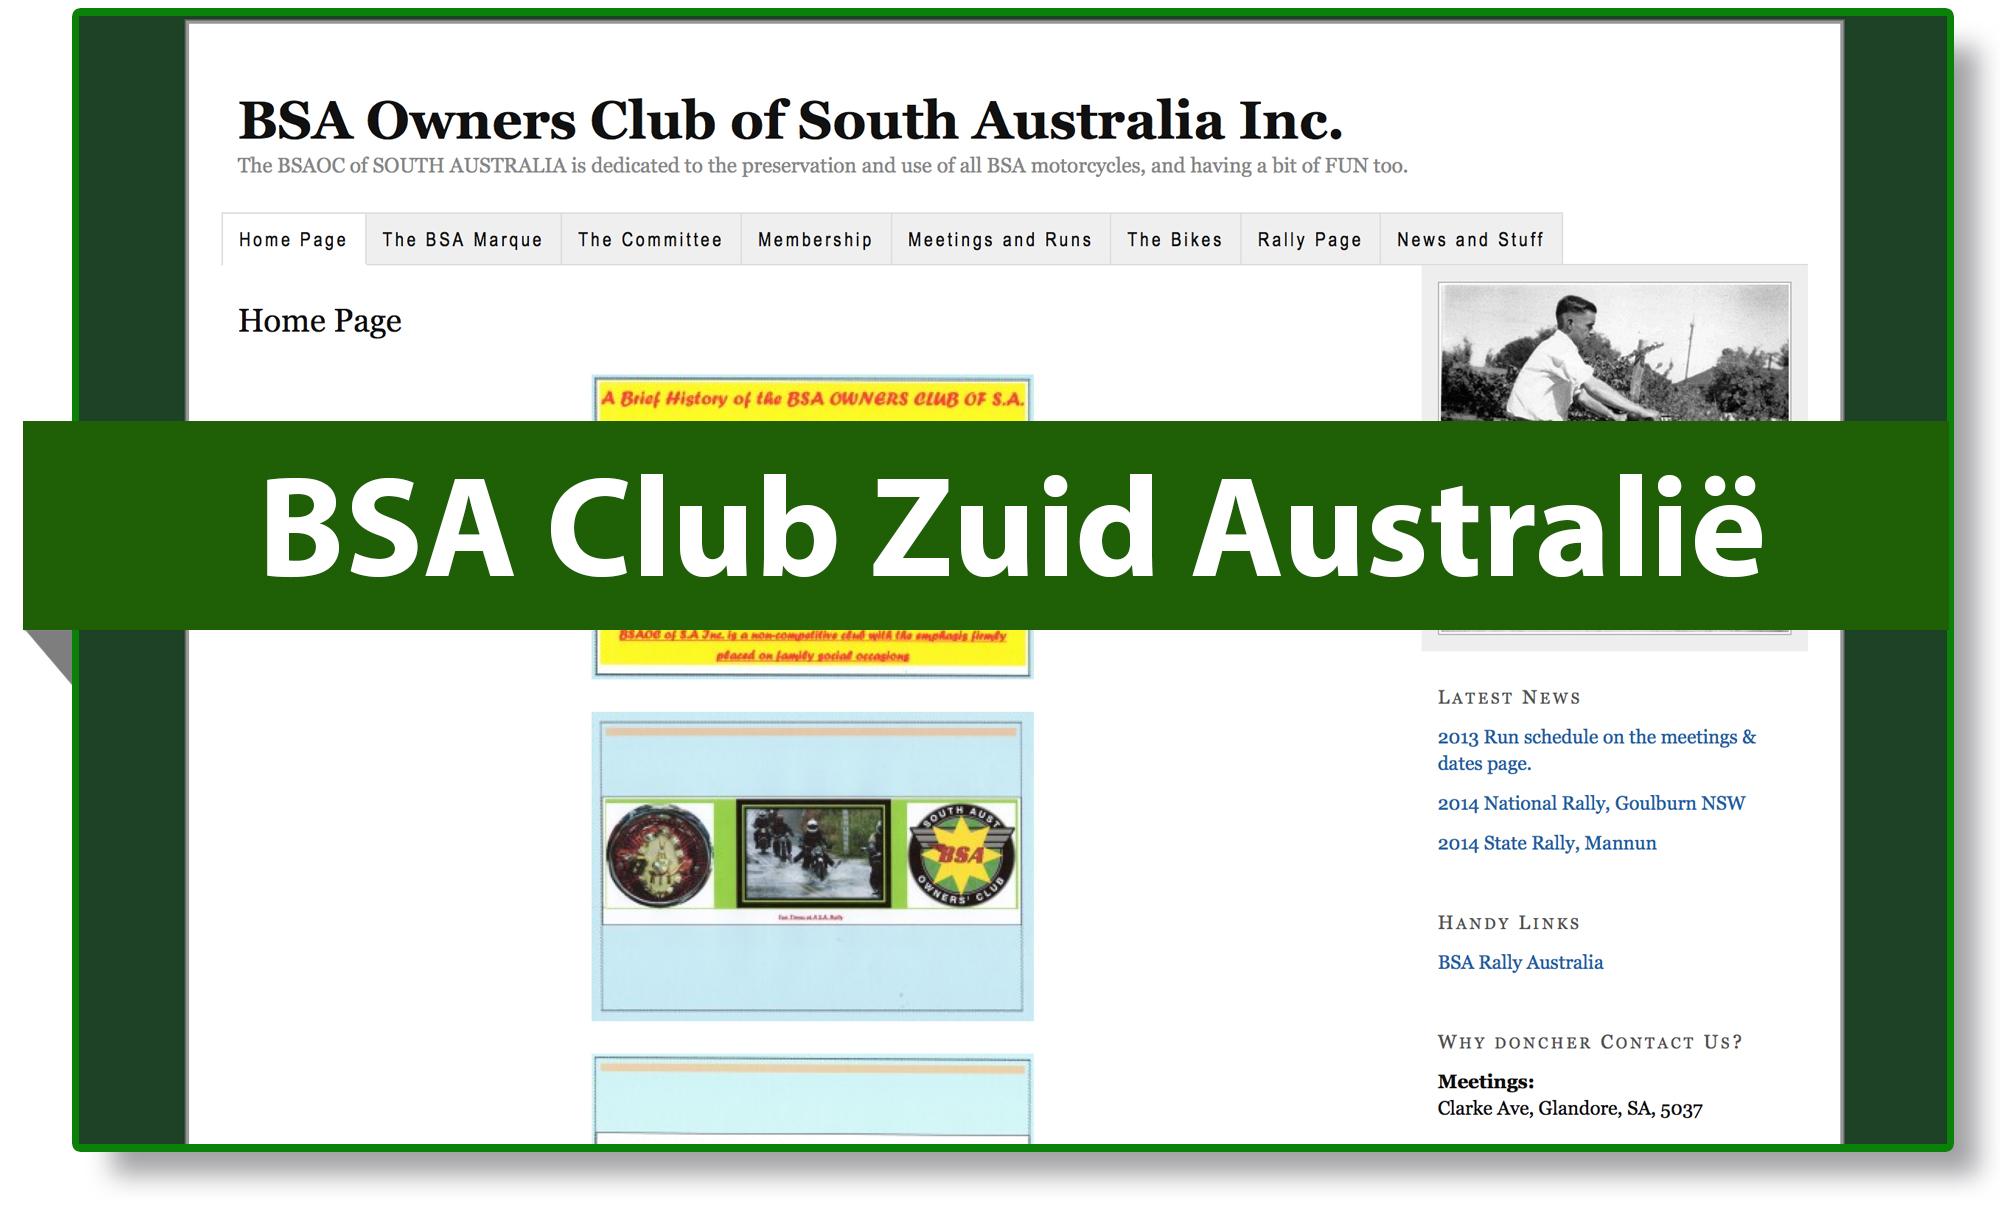 BSA club Zuid Australië